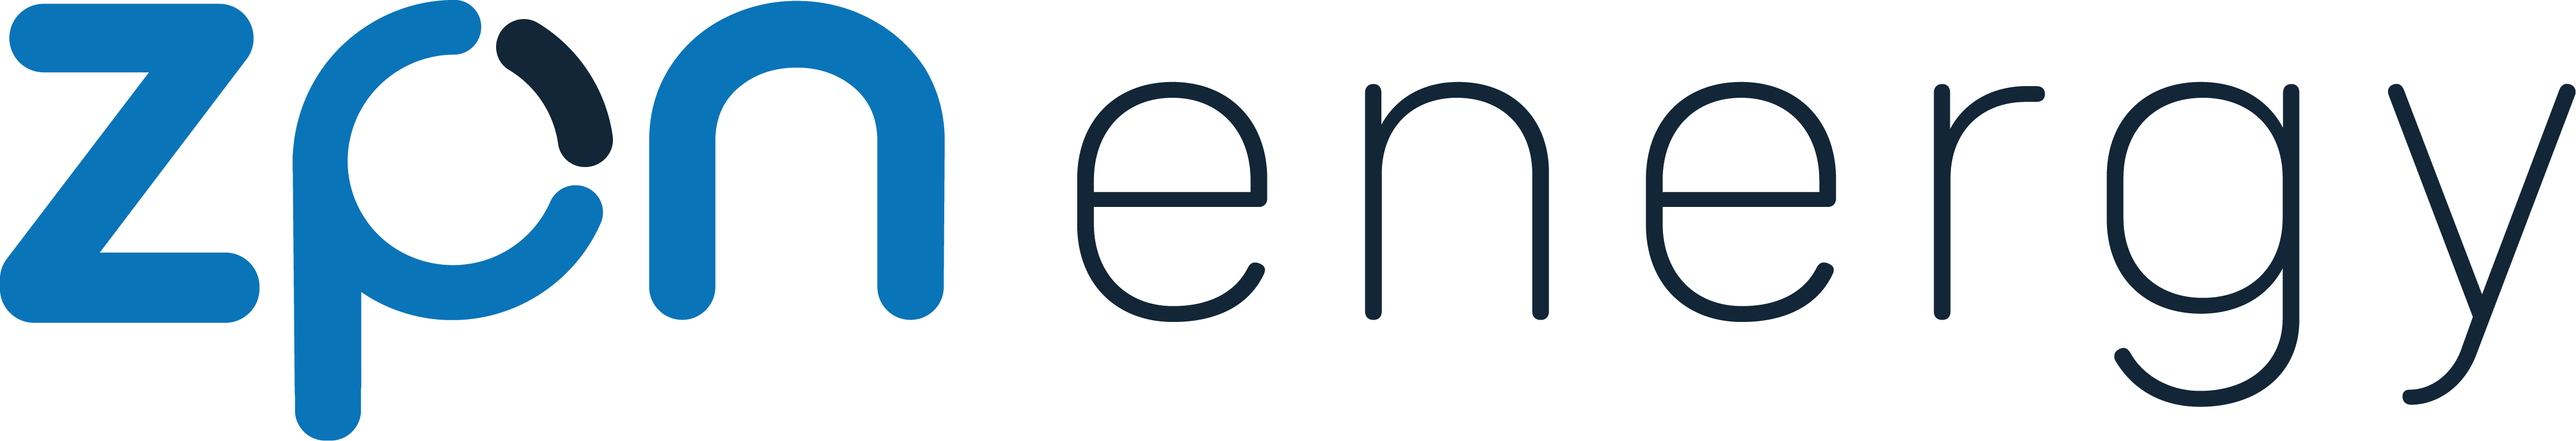 ZPN_logo_typographic_dark